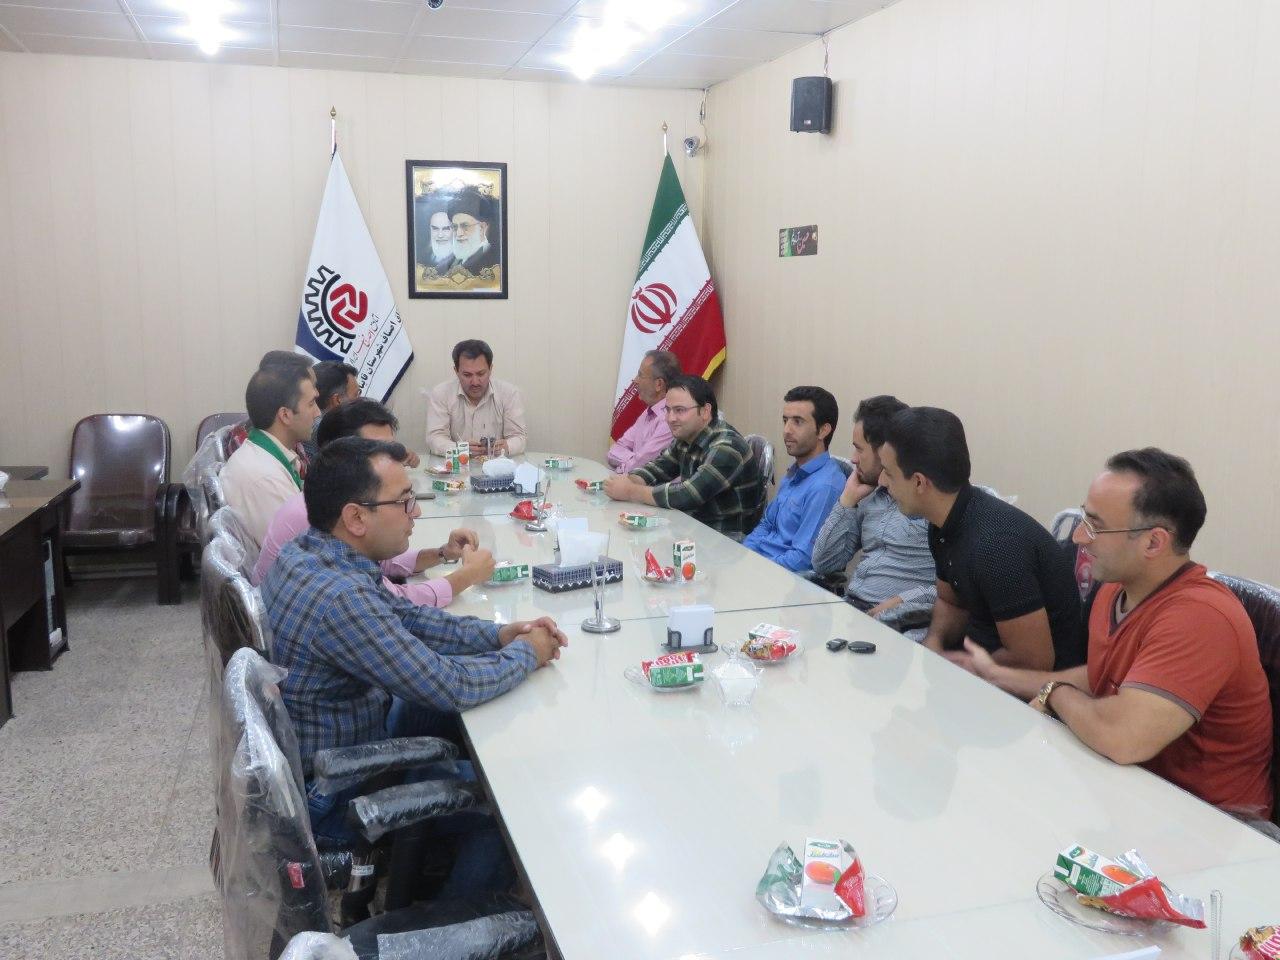 di-AOIO برگزاری جلسه طلا و جواهر شهرستان